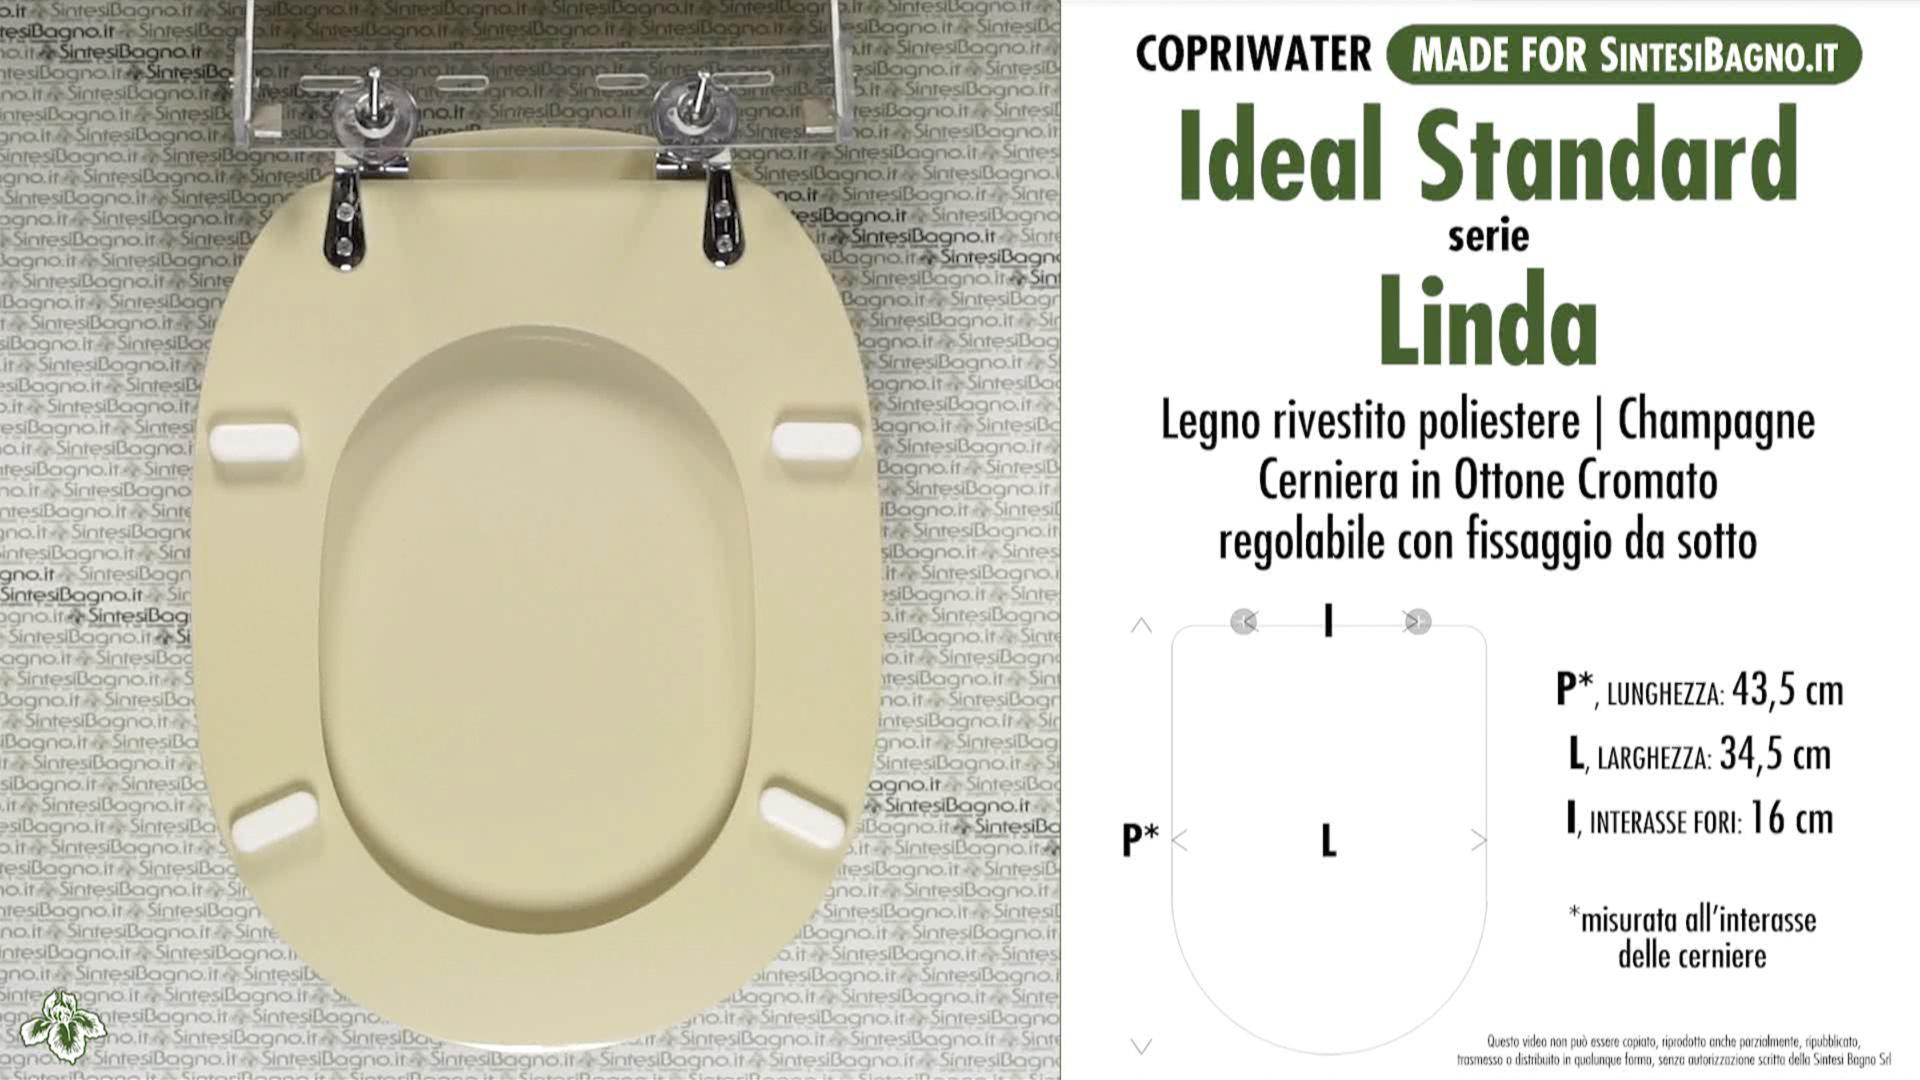 Copriwater per wc linda ideal standard champagne for Misure copriwater ideal standard